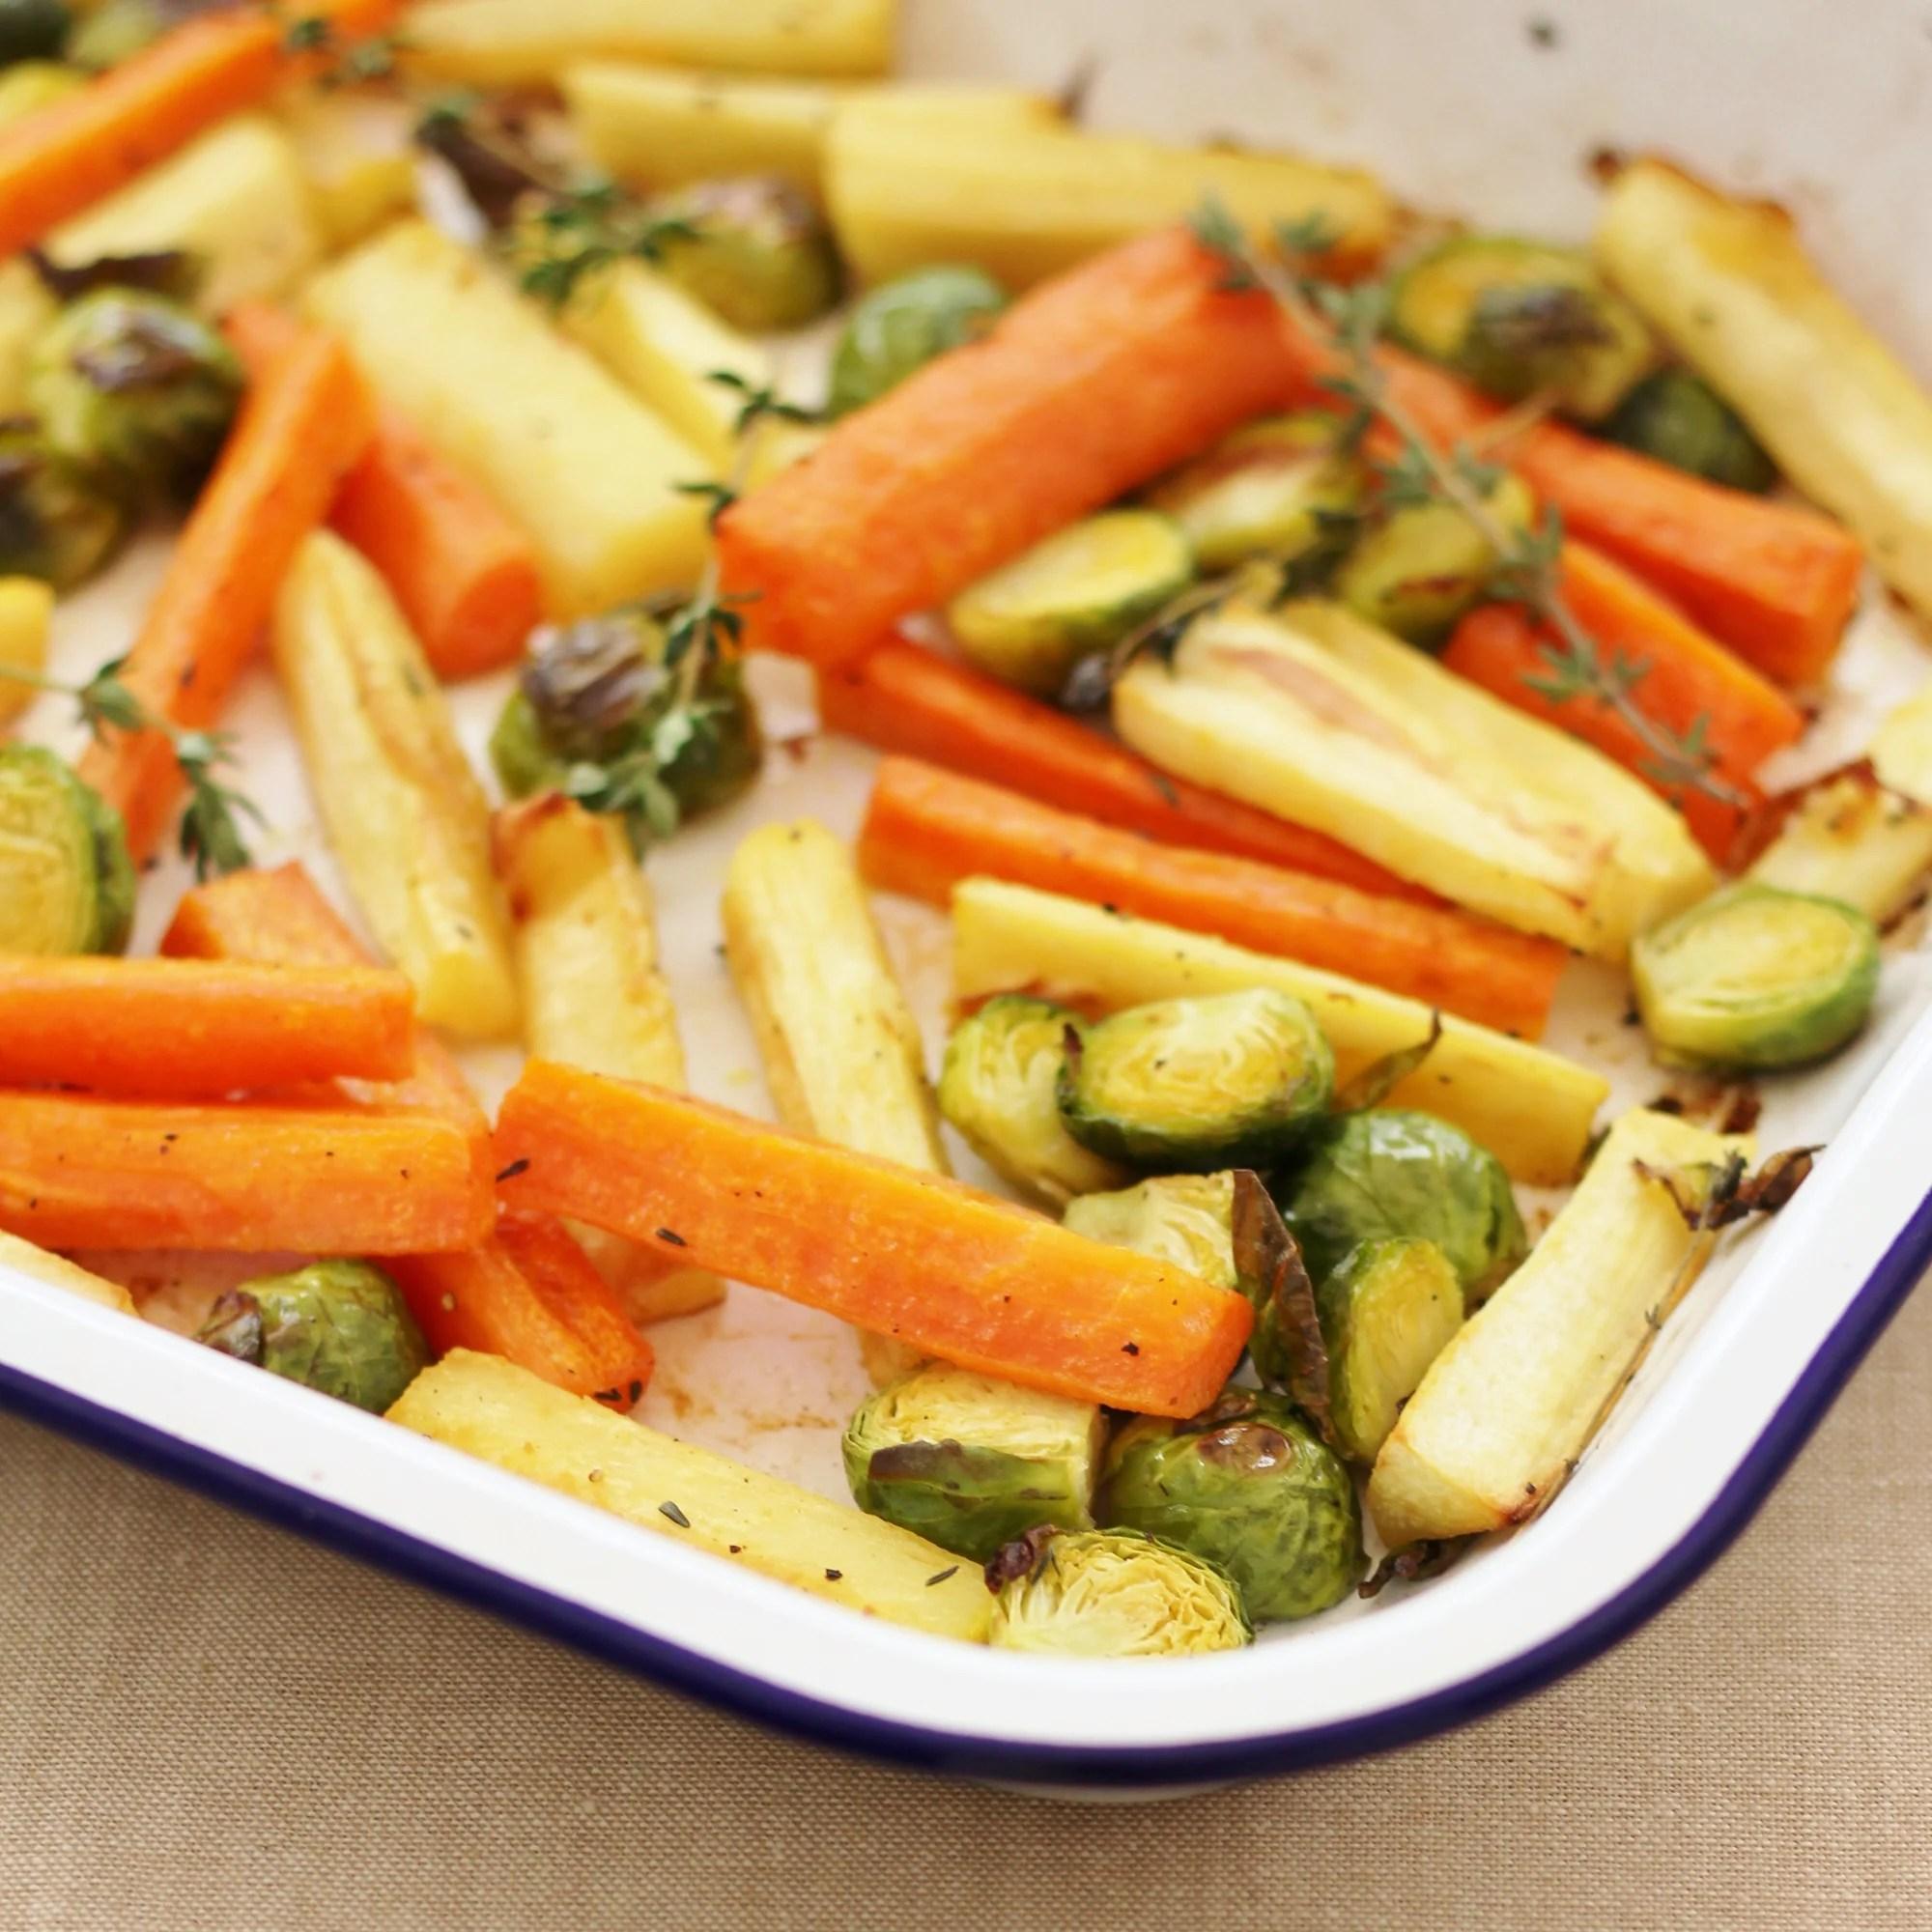 easy christmas vegetable traybake easy peasy foodie - Christmas Dish